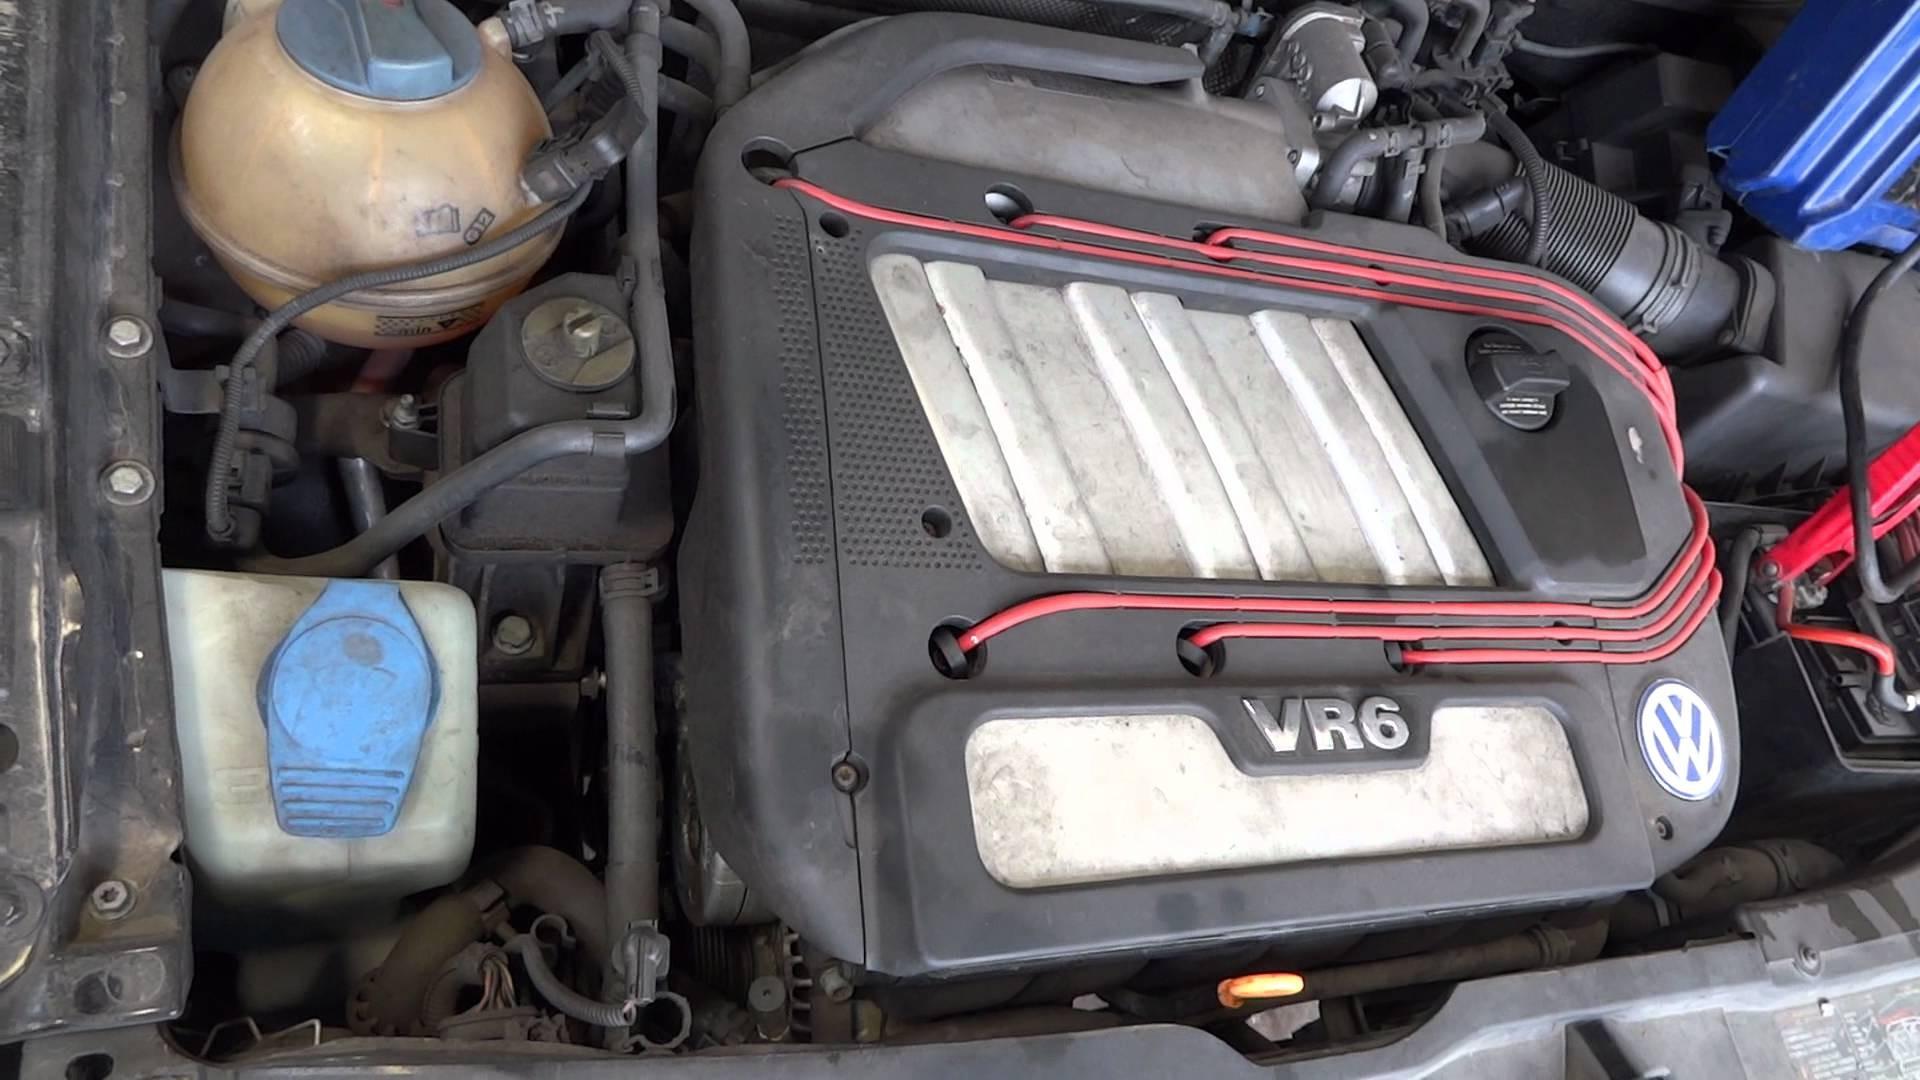 2001 Vw Jetta Vr6 Engine Diagram Wiring Diagrams Chin Manage Chin Manage Alcuoredeldiabete It